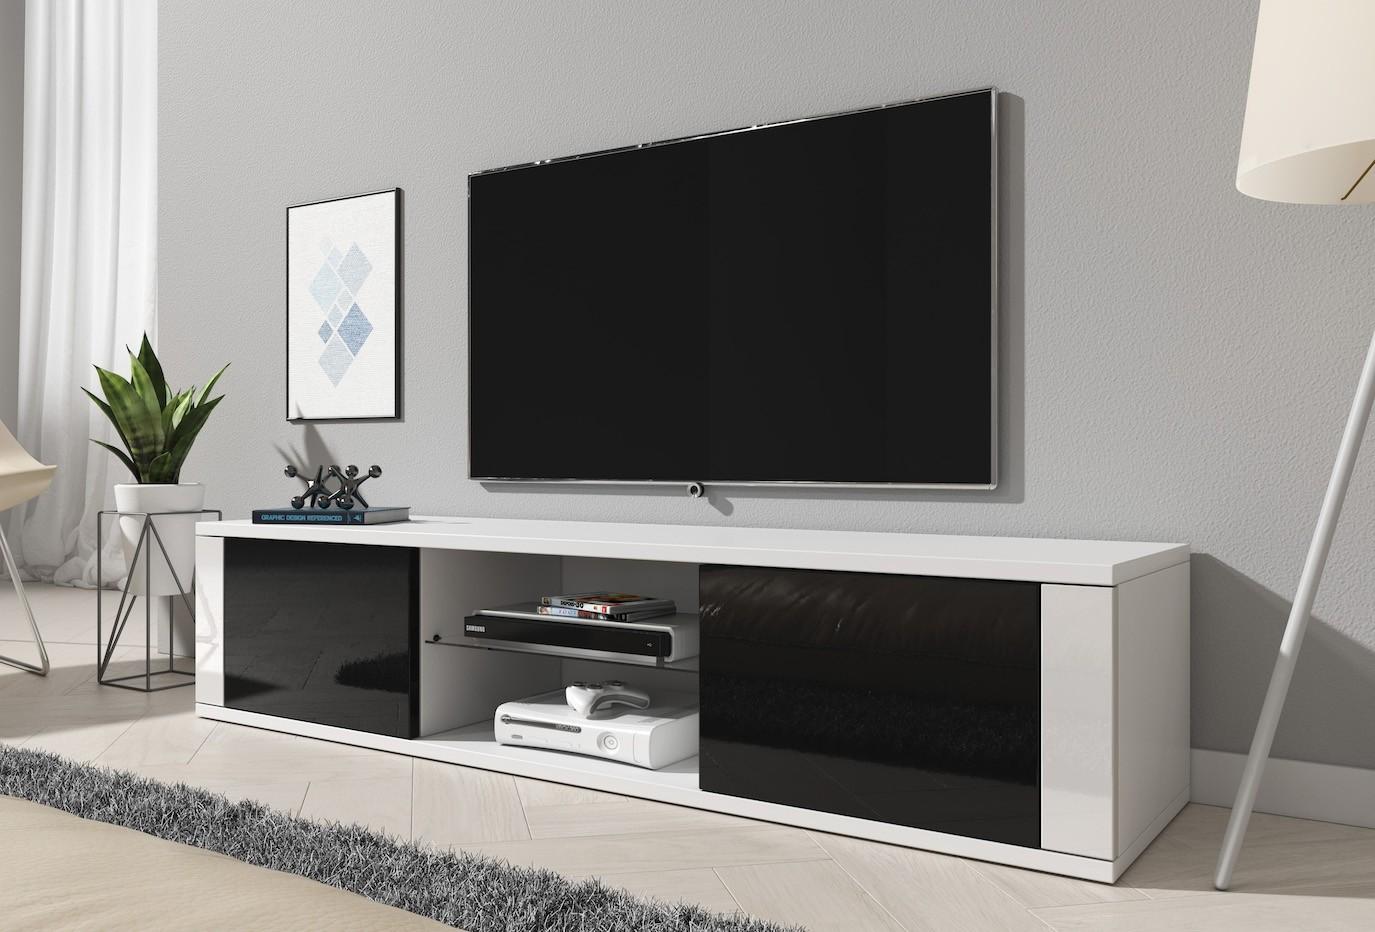 Tv Kast Zwart Wit.Tv Meubel Henna Wit Zwart 140 Cm Meubella